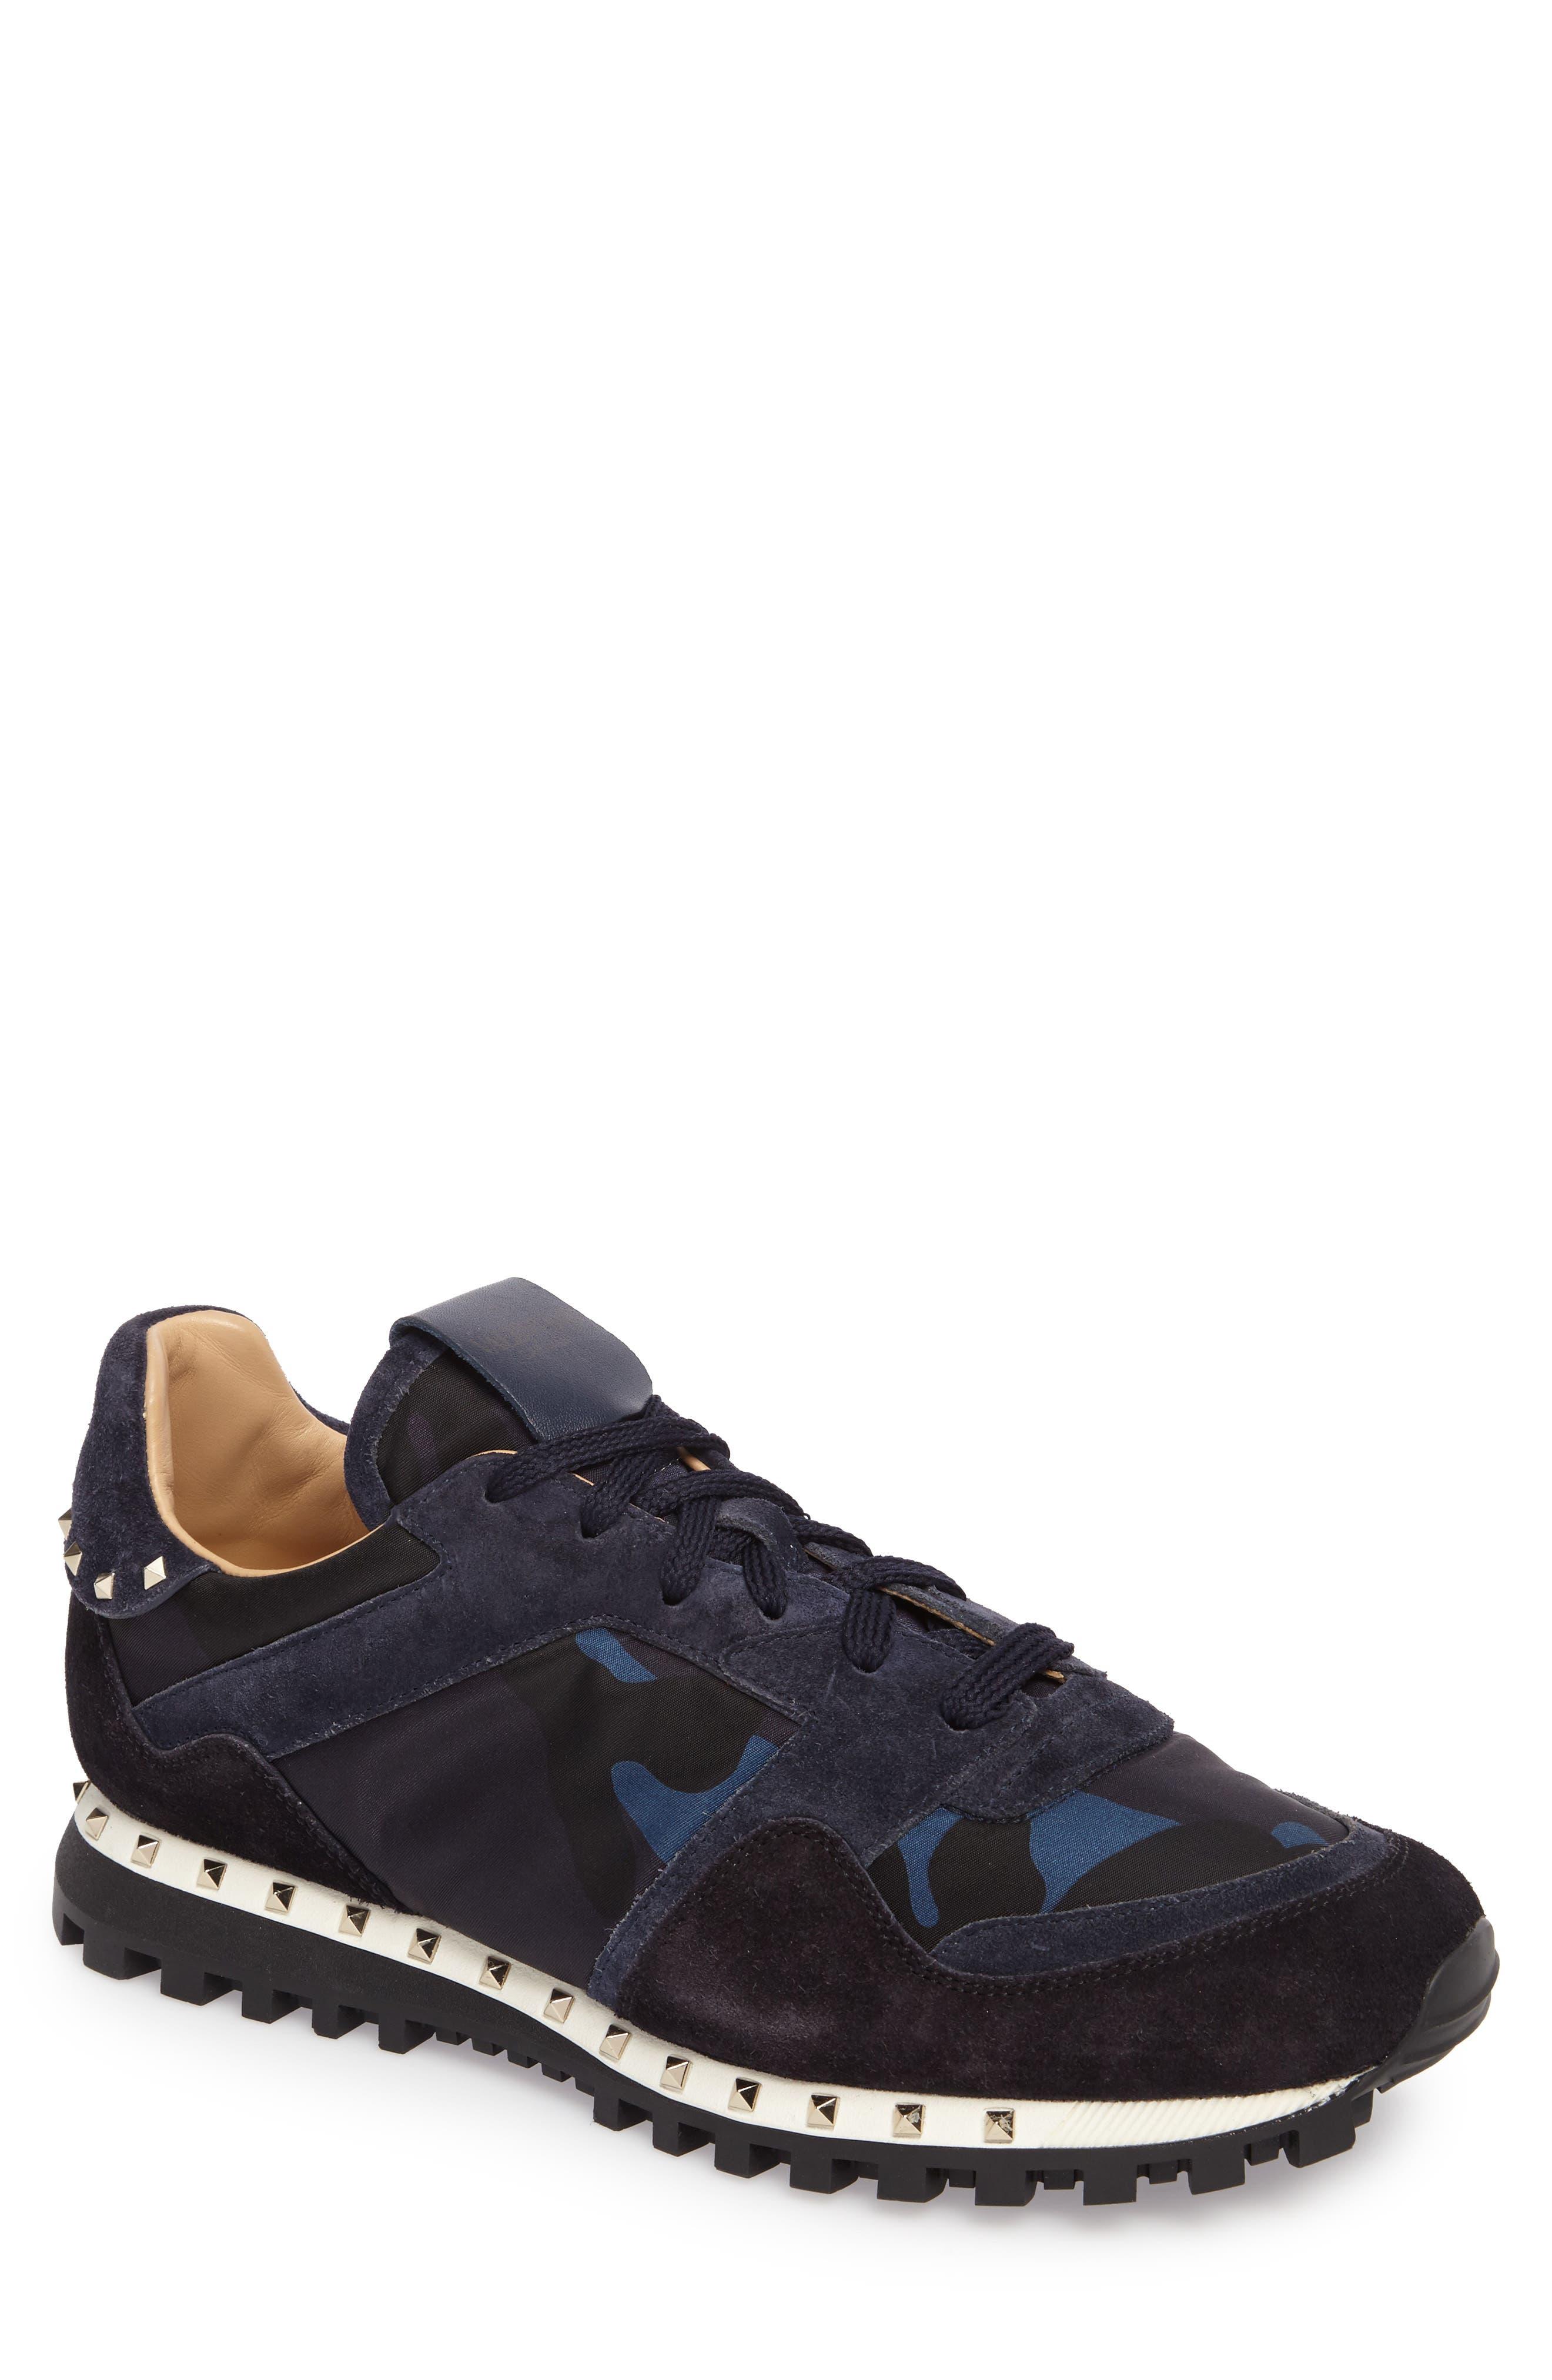 Camo Rockstud Sneaker,                             Main thumbnail 1, color,                             Marine/ Nero/ Dark Blue